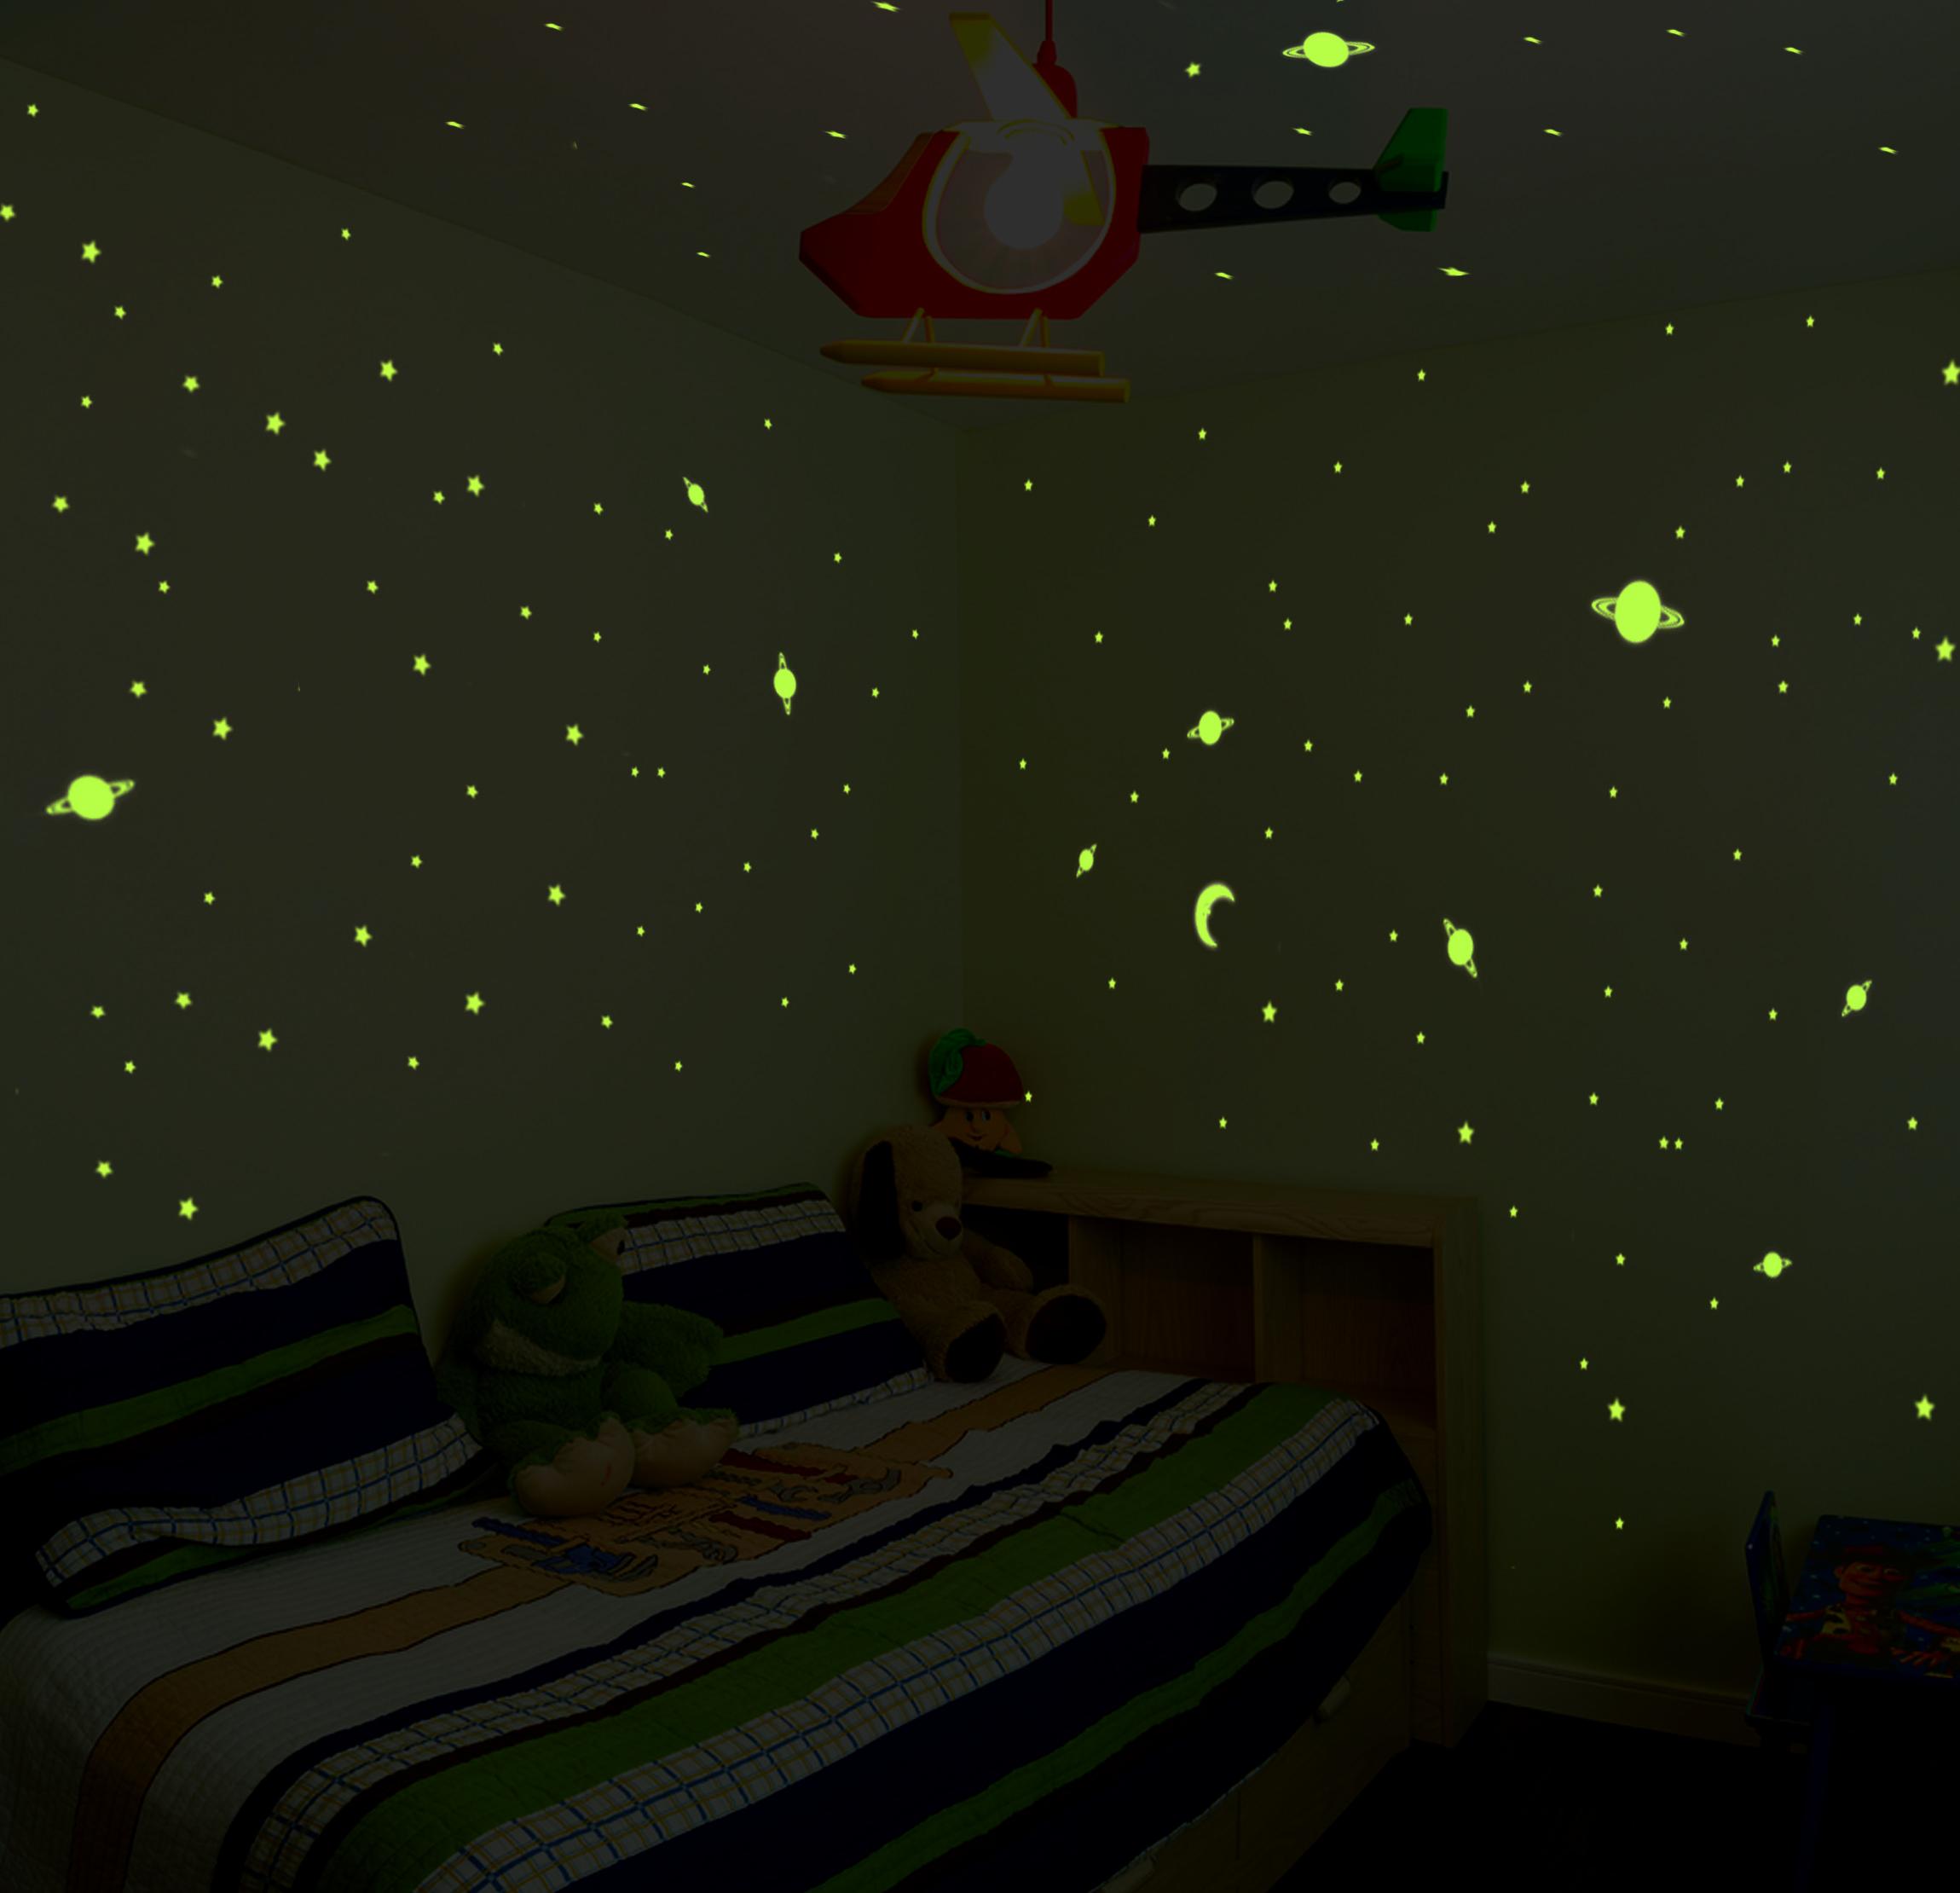 sticker univers environ 150 toiles et plan tes phosphorescentes stickers b b s fille. Black Bedroom Furniture Sets. Home Design Ideas